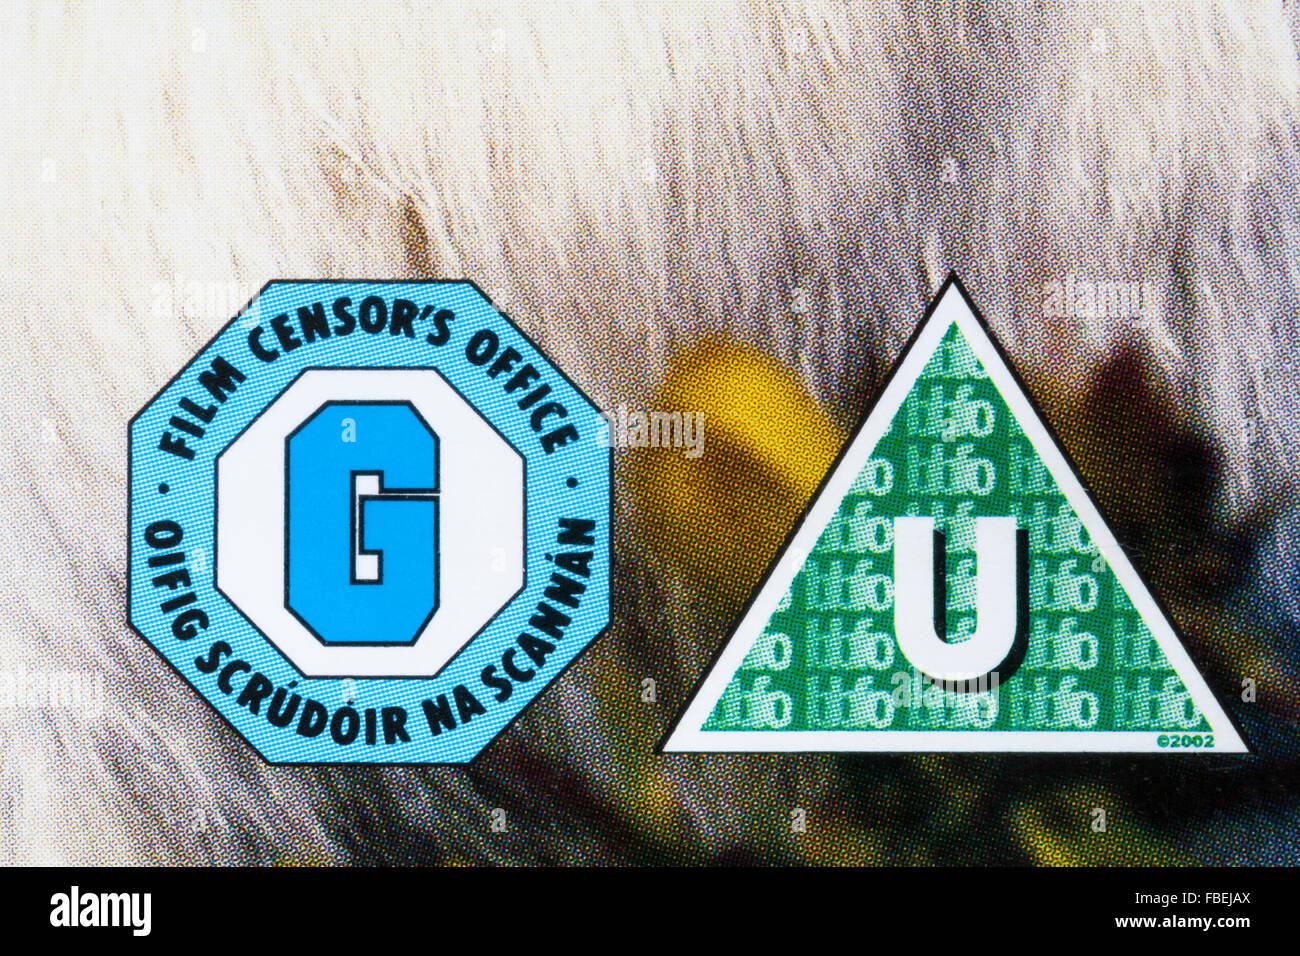 U Bewertung auf dvd Fall g film Zensur Stockfoto, Bild: 93134802 - Alamy